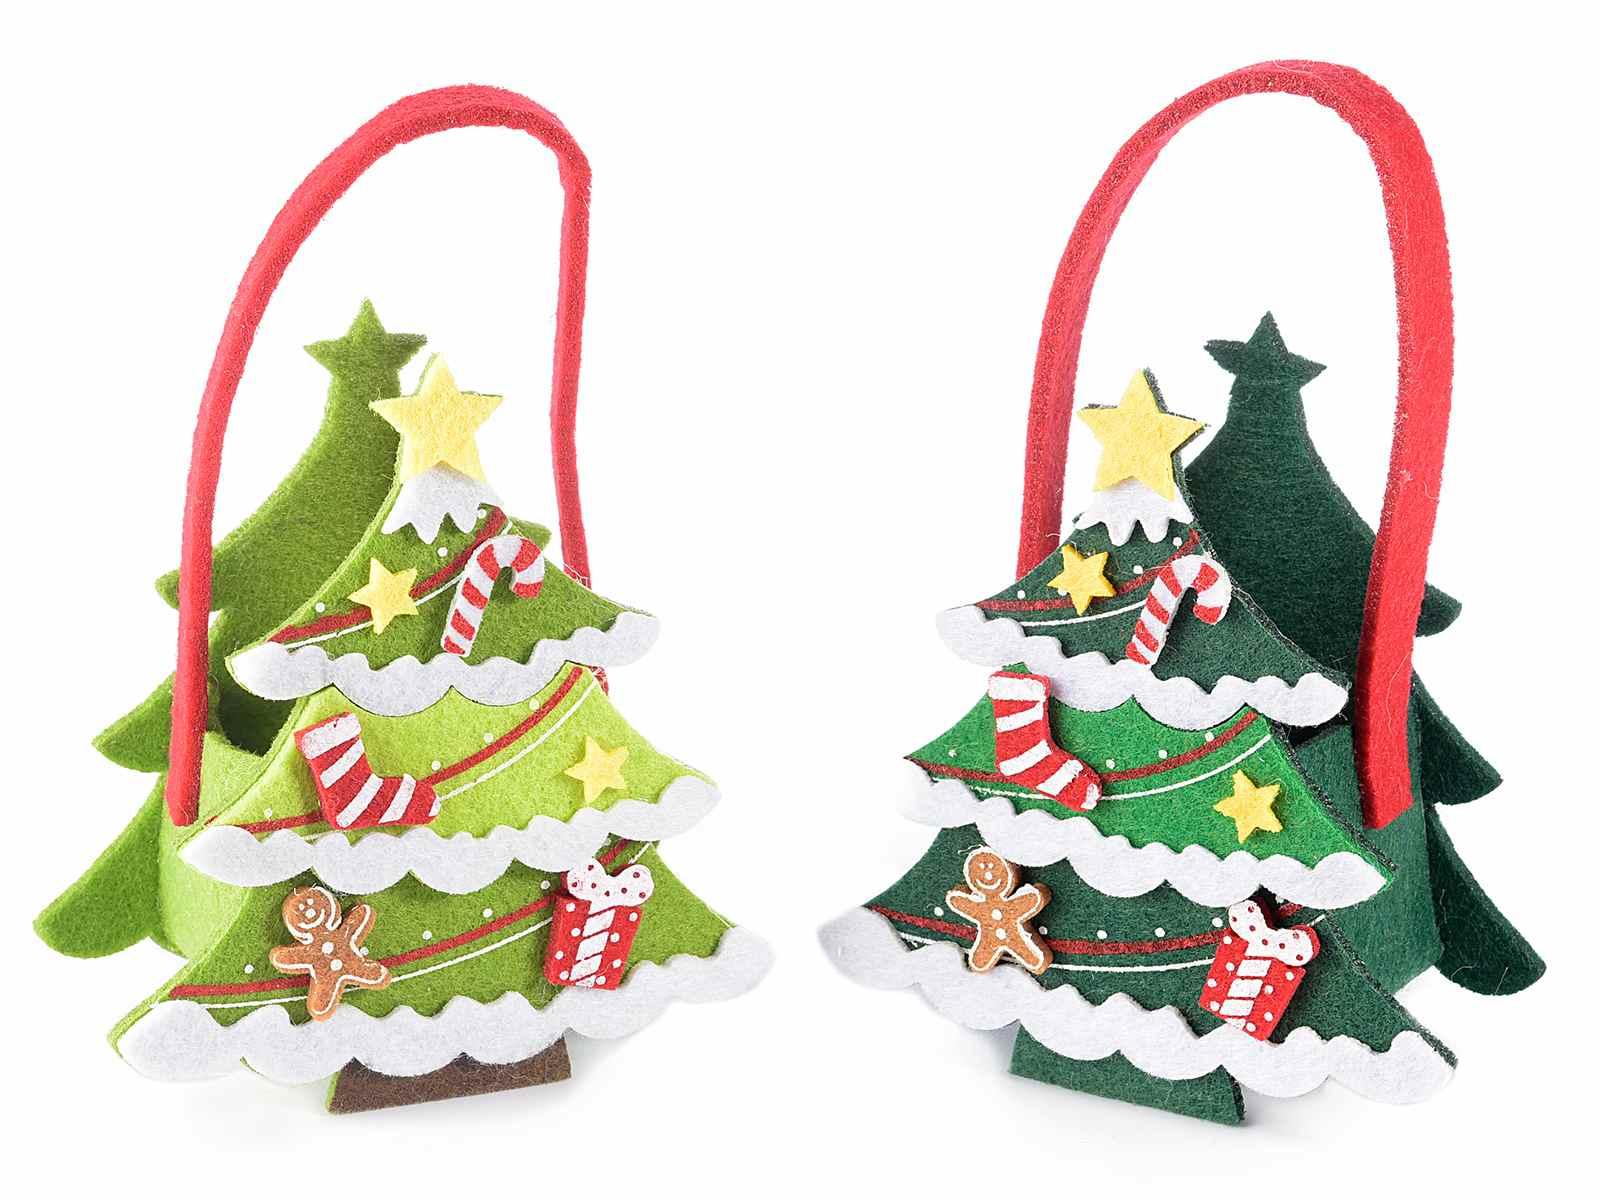 Christmas tree felt bag (56.30.94) - Art From Italy